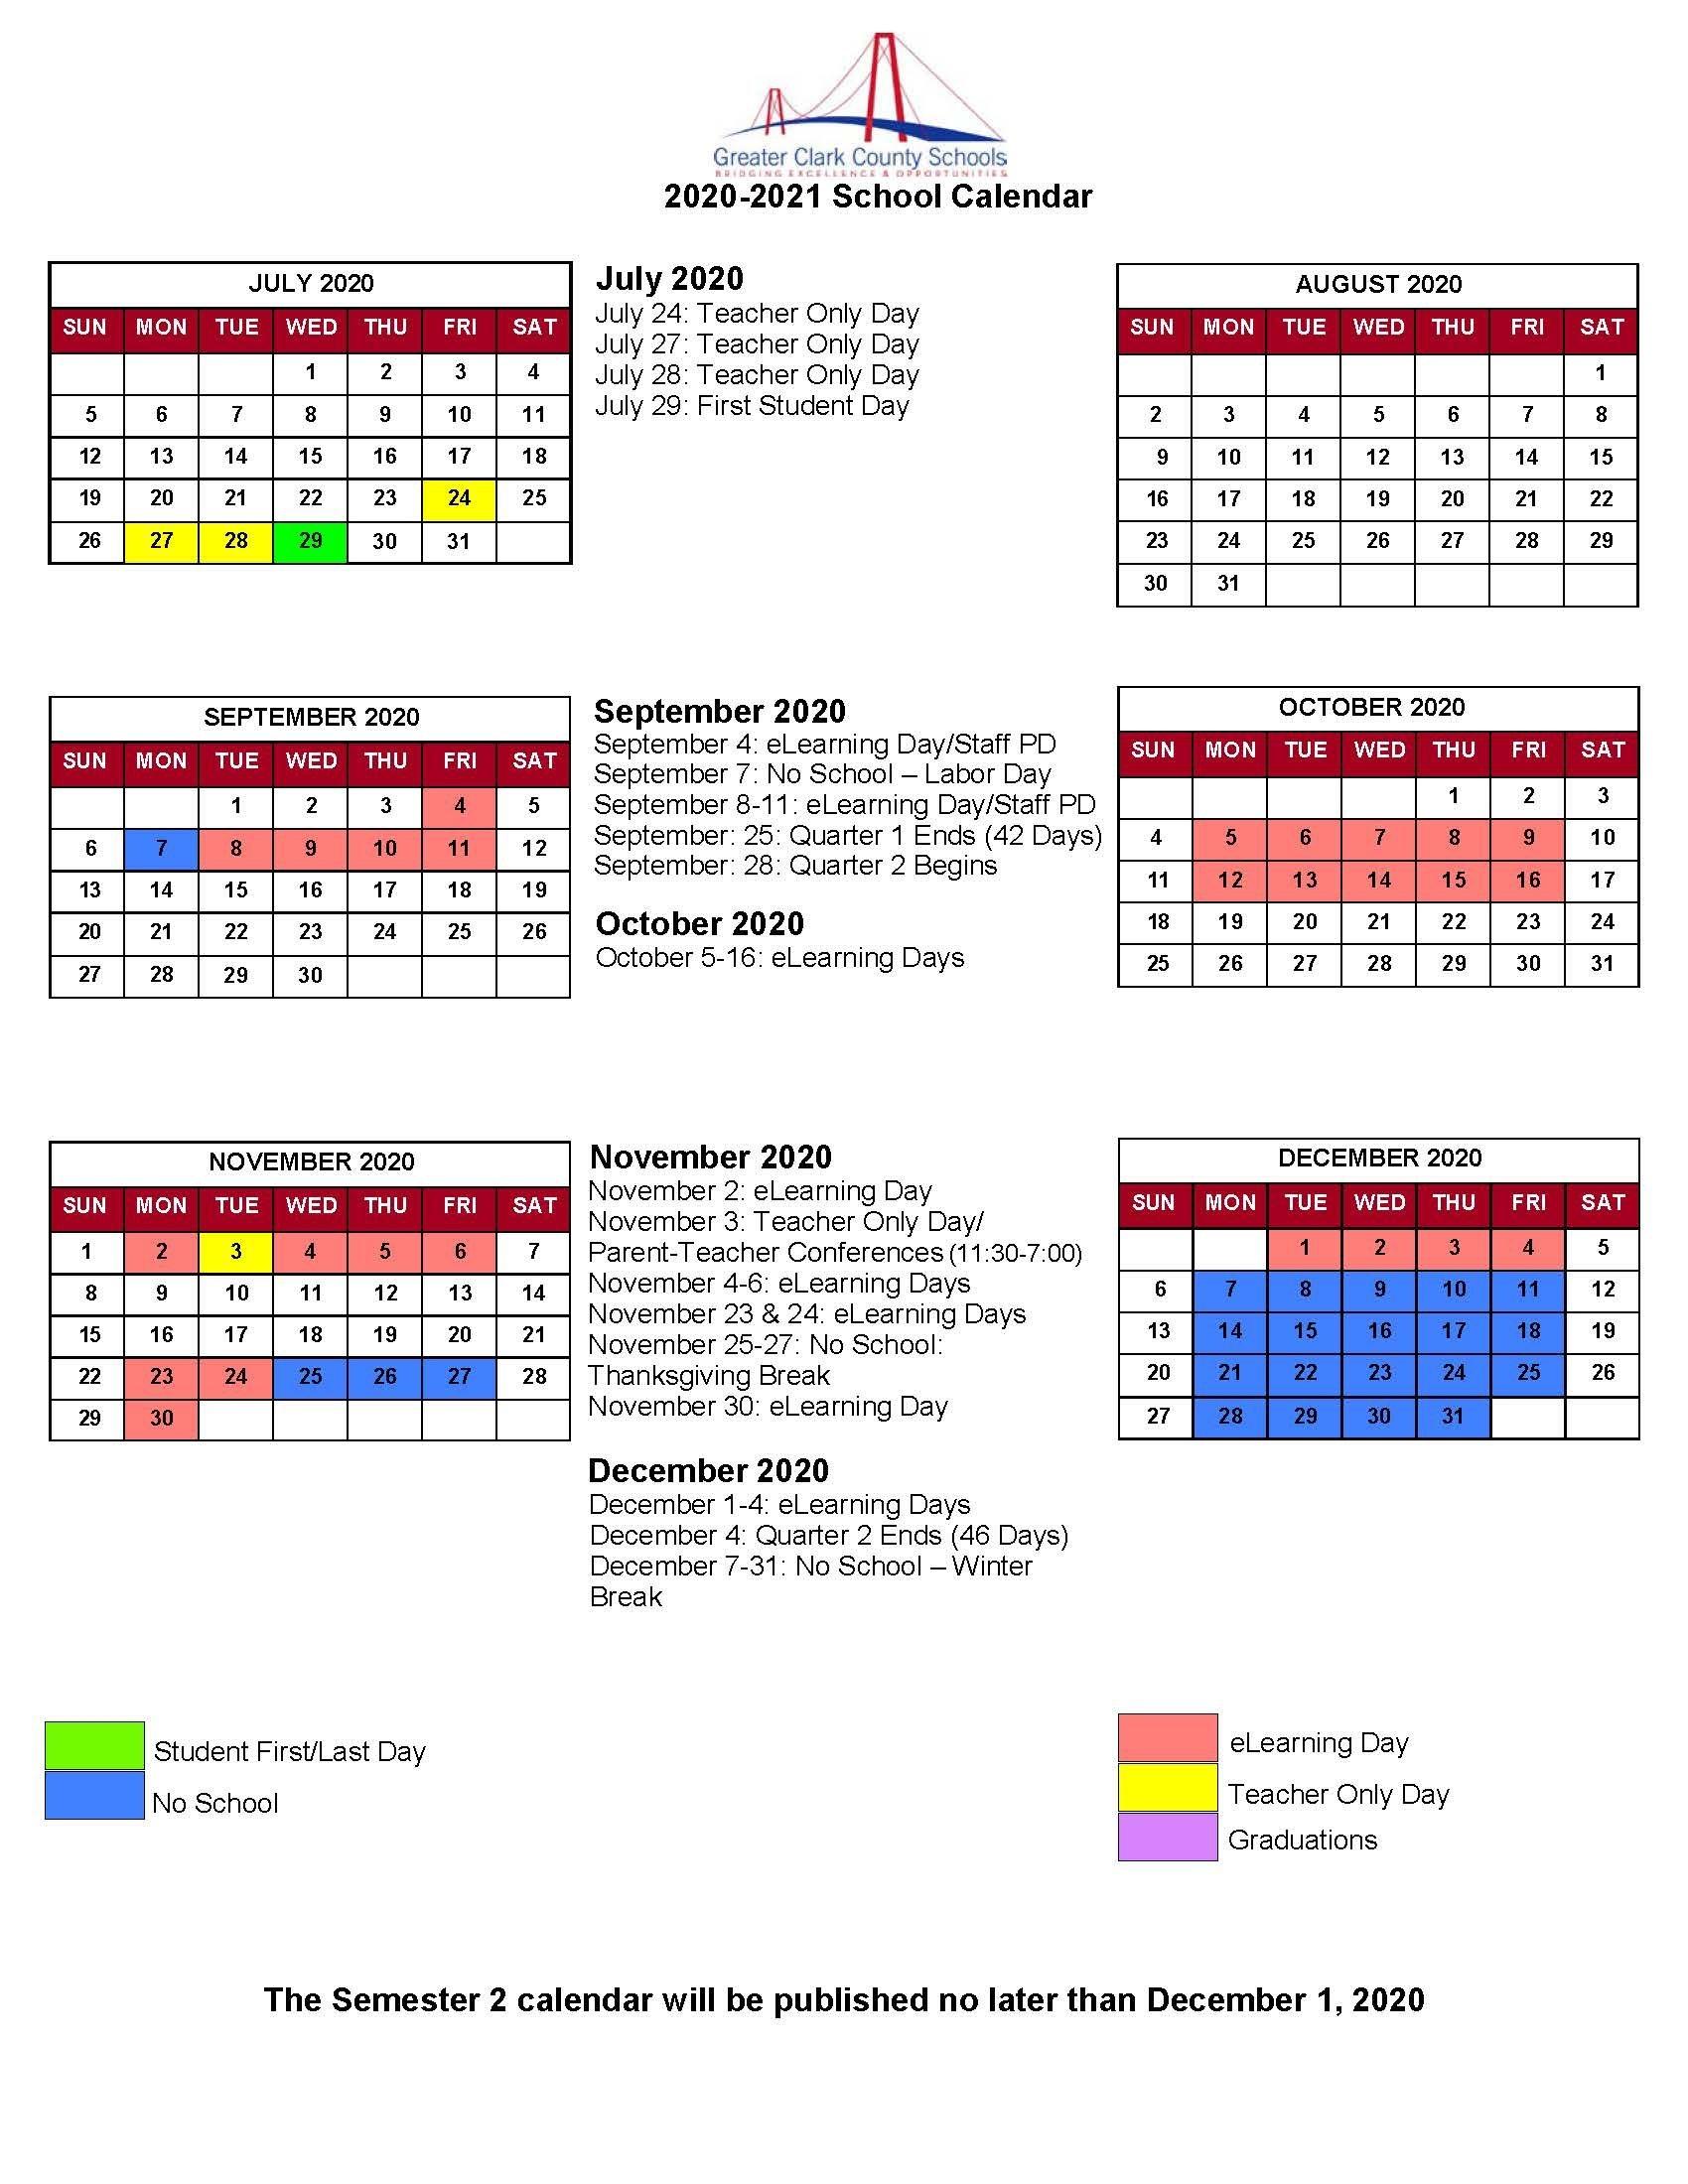 Greater Clark County Schools Calendar 2021 And 2022